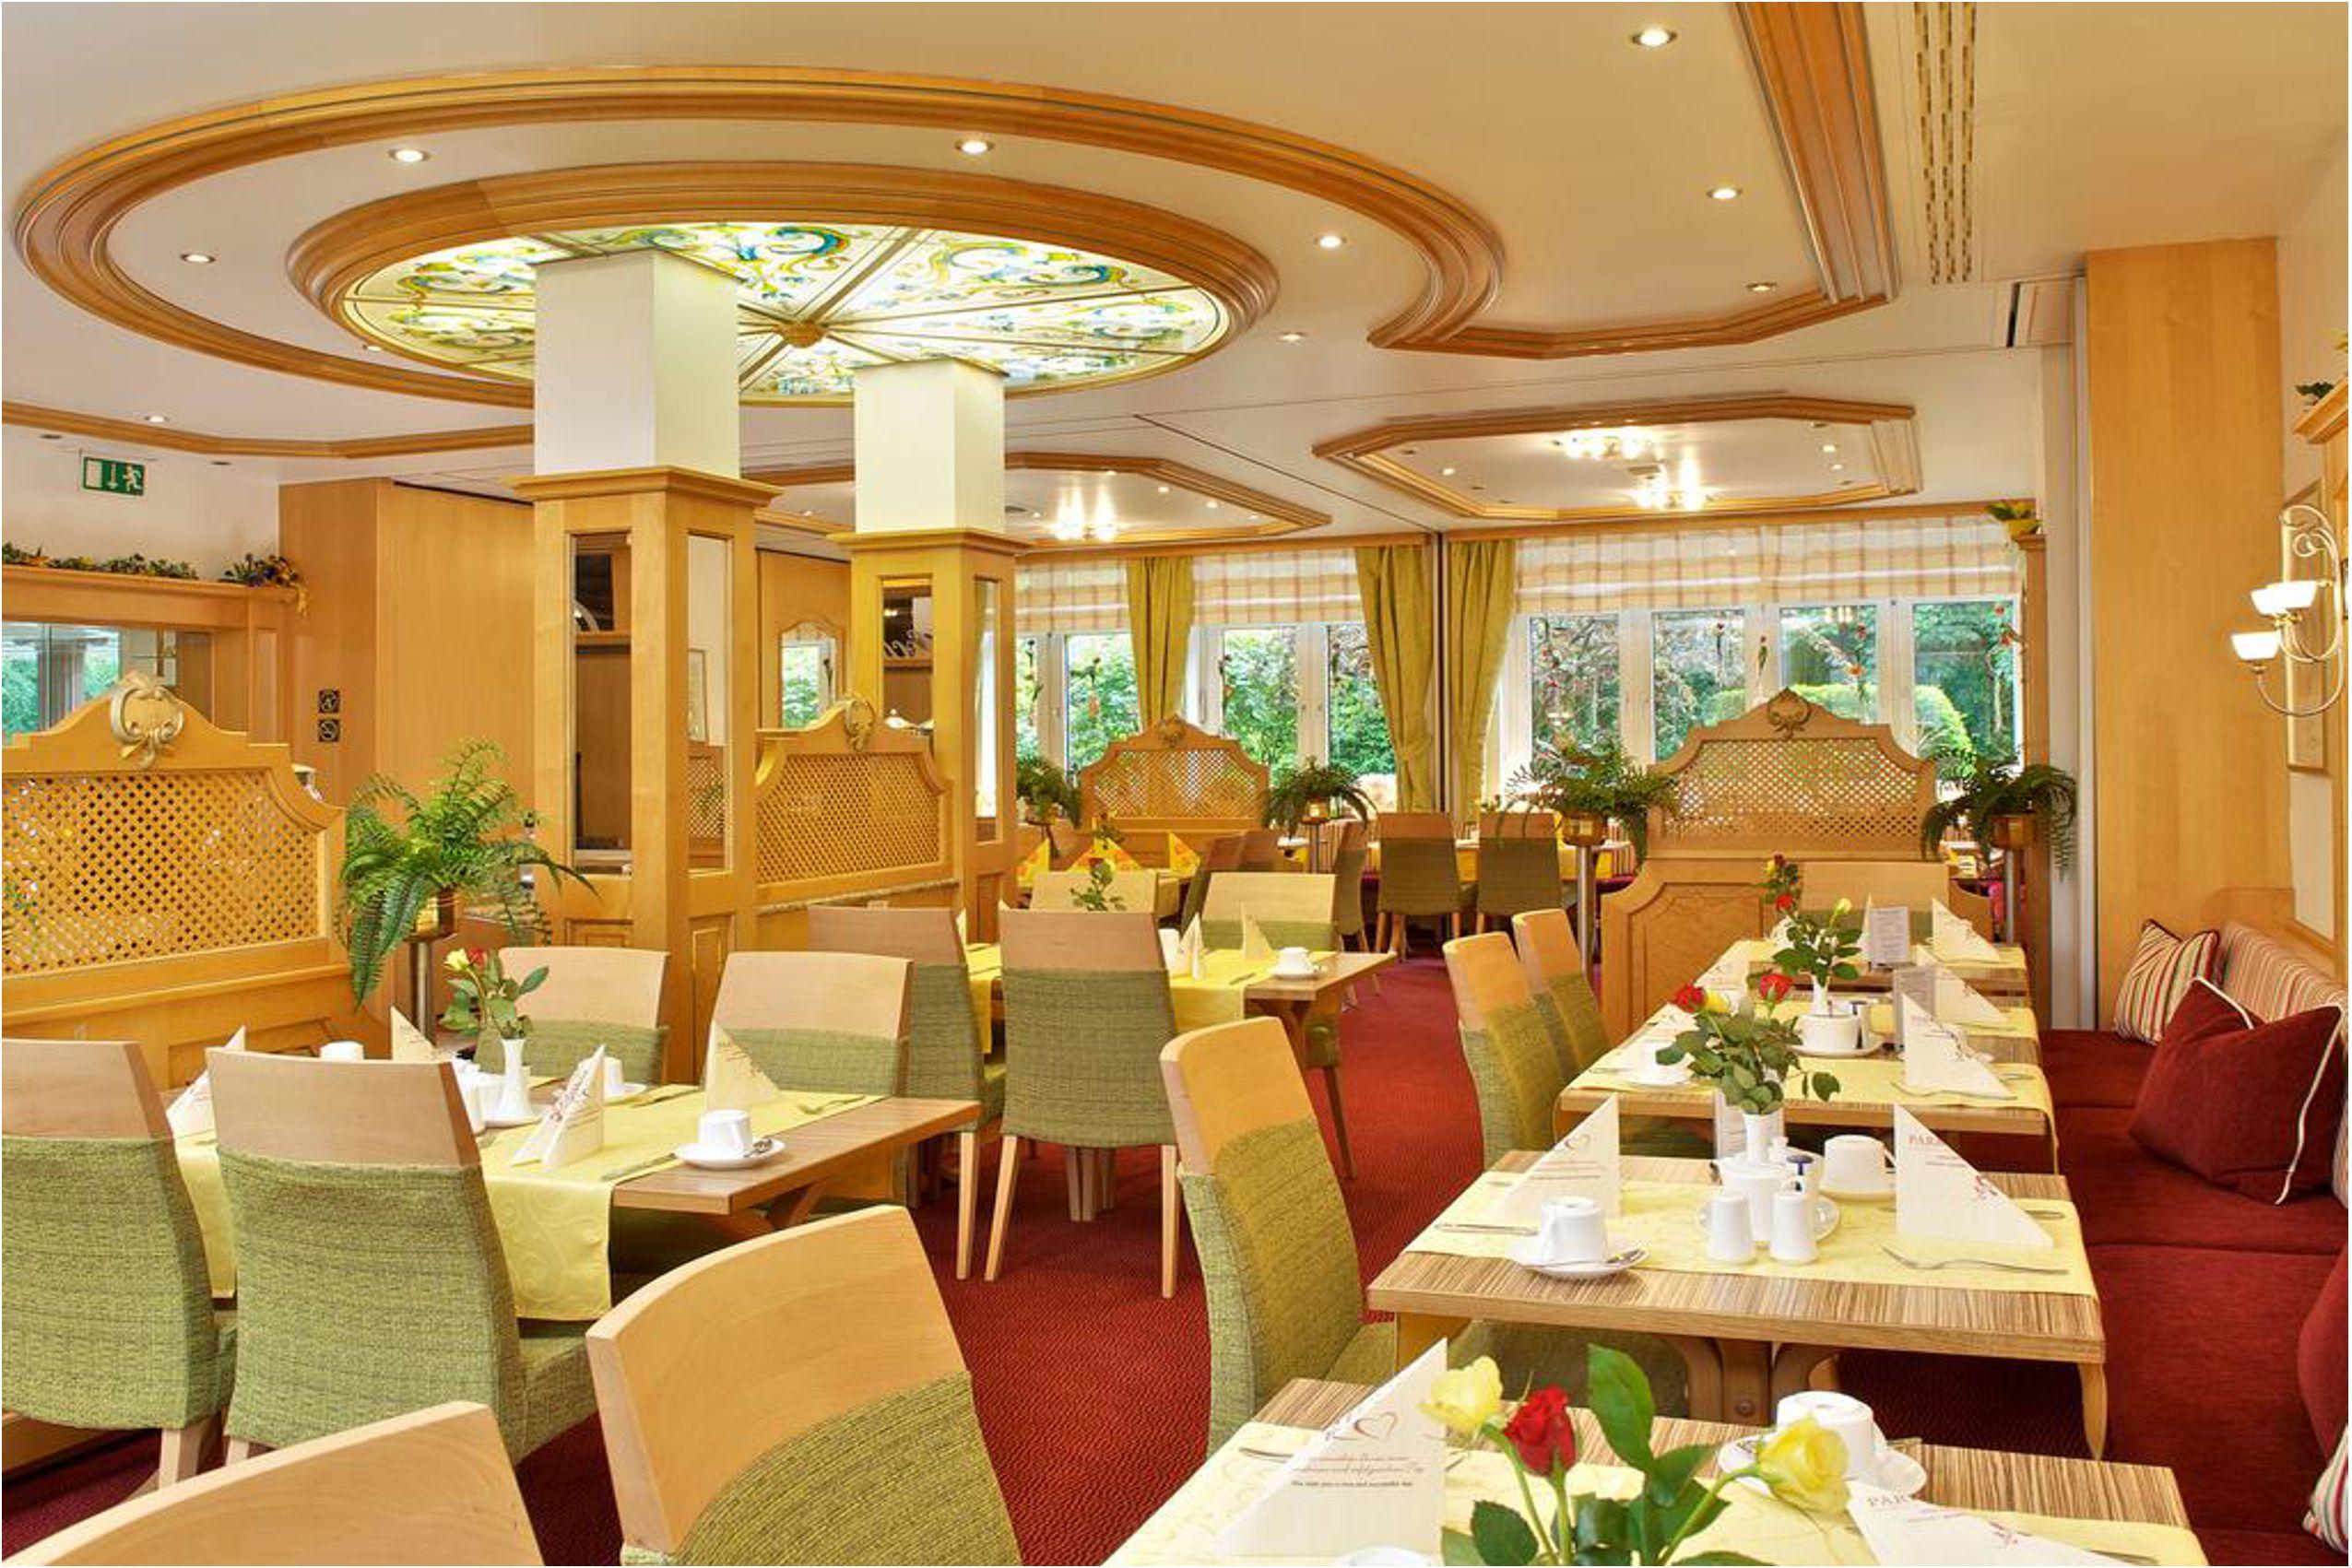 Arredamenti per hotel e ristoranti for Arredamenti per ristoranti